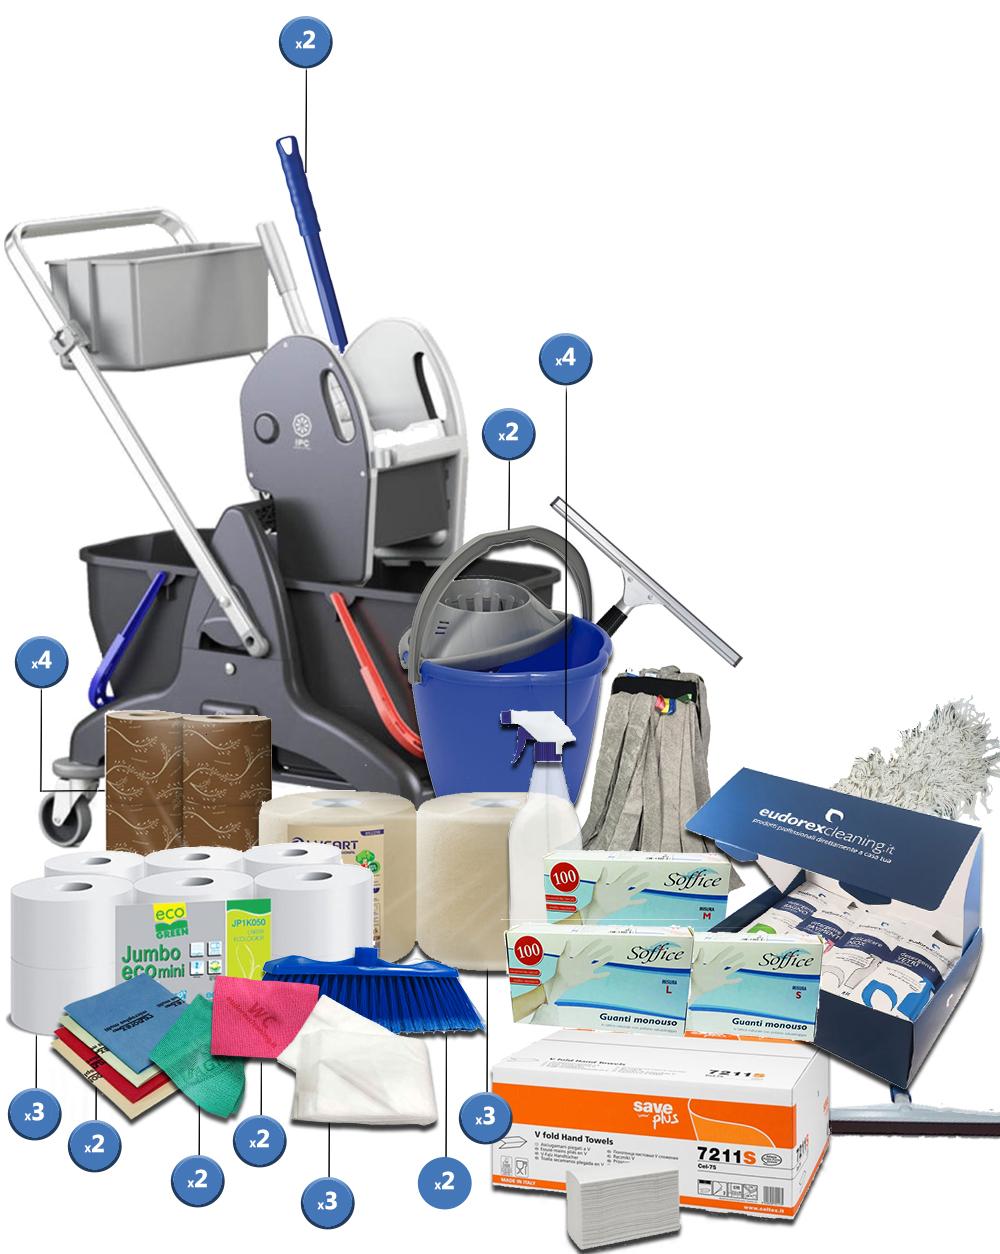 <span class='p-name'>Kit completo imprese pulizie con carrello a doppia vasca &#8211; 39 prodotti</span>